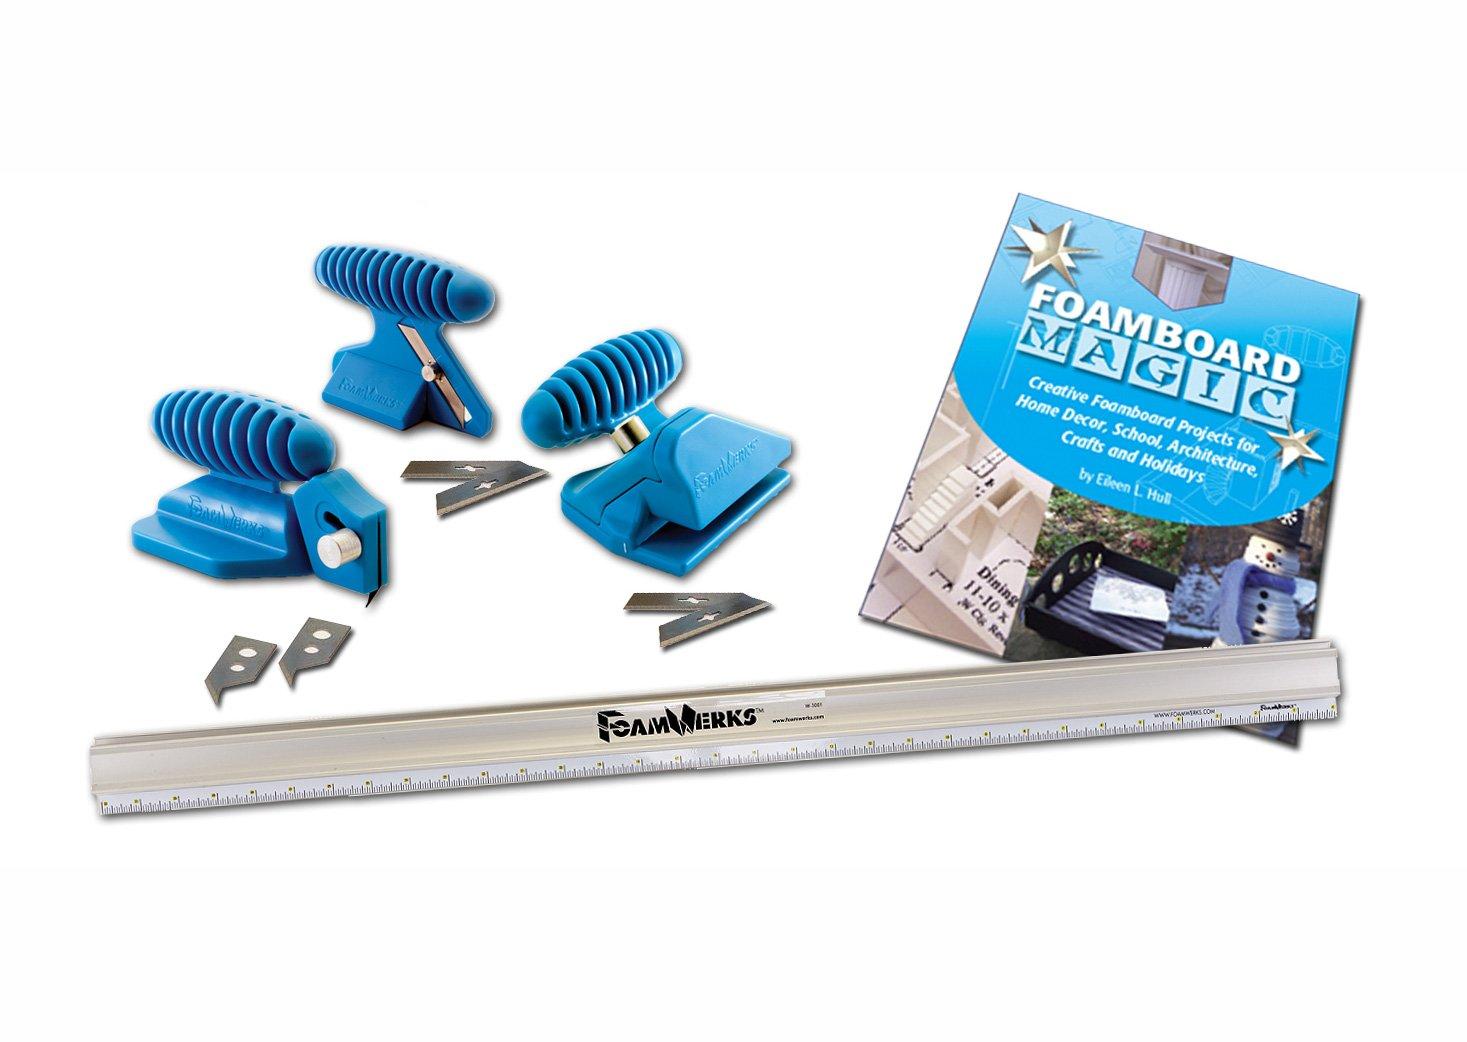 Logan Graphics FoamWerks Foamboard Cutting Kit-W1001-For Cutting All Foamboard